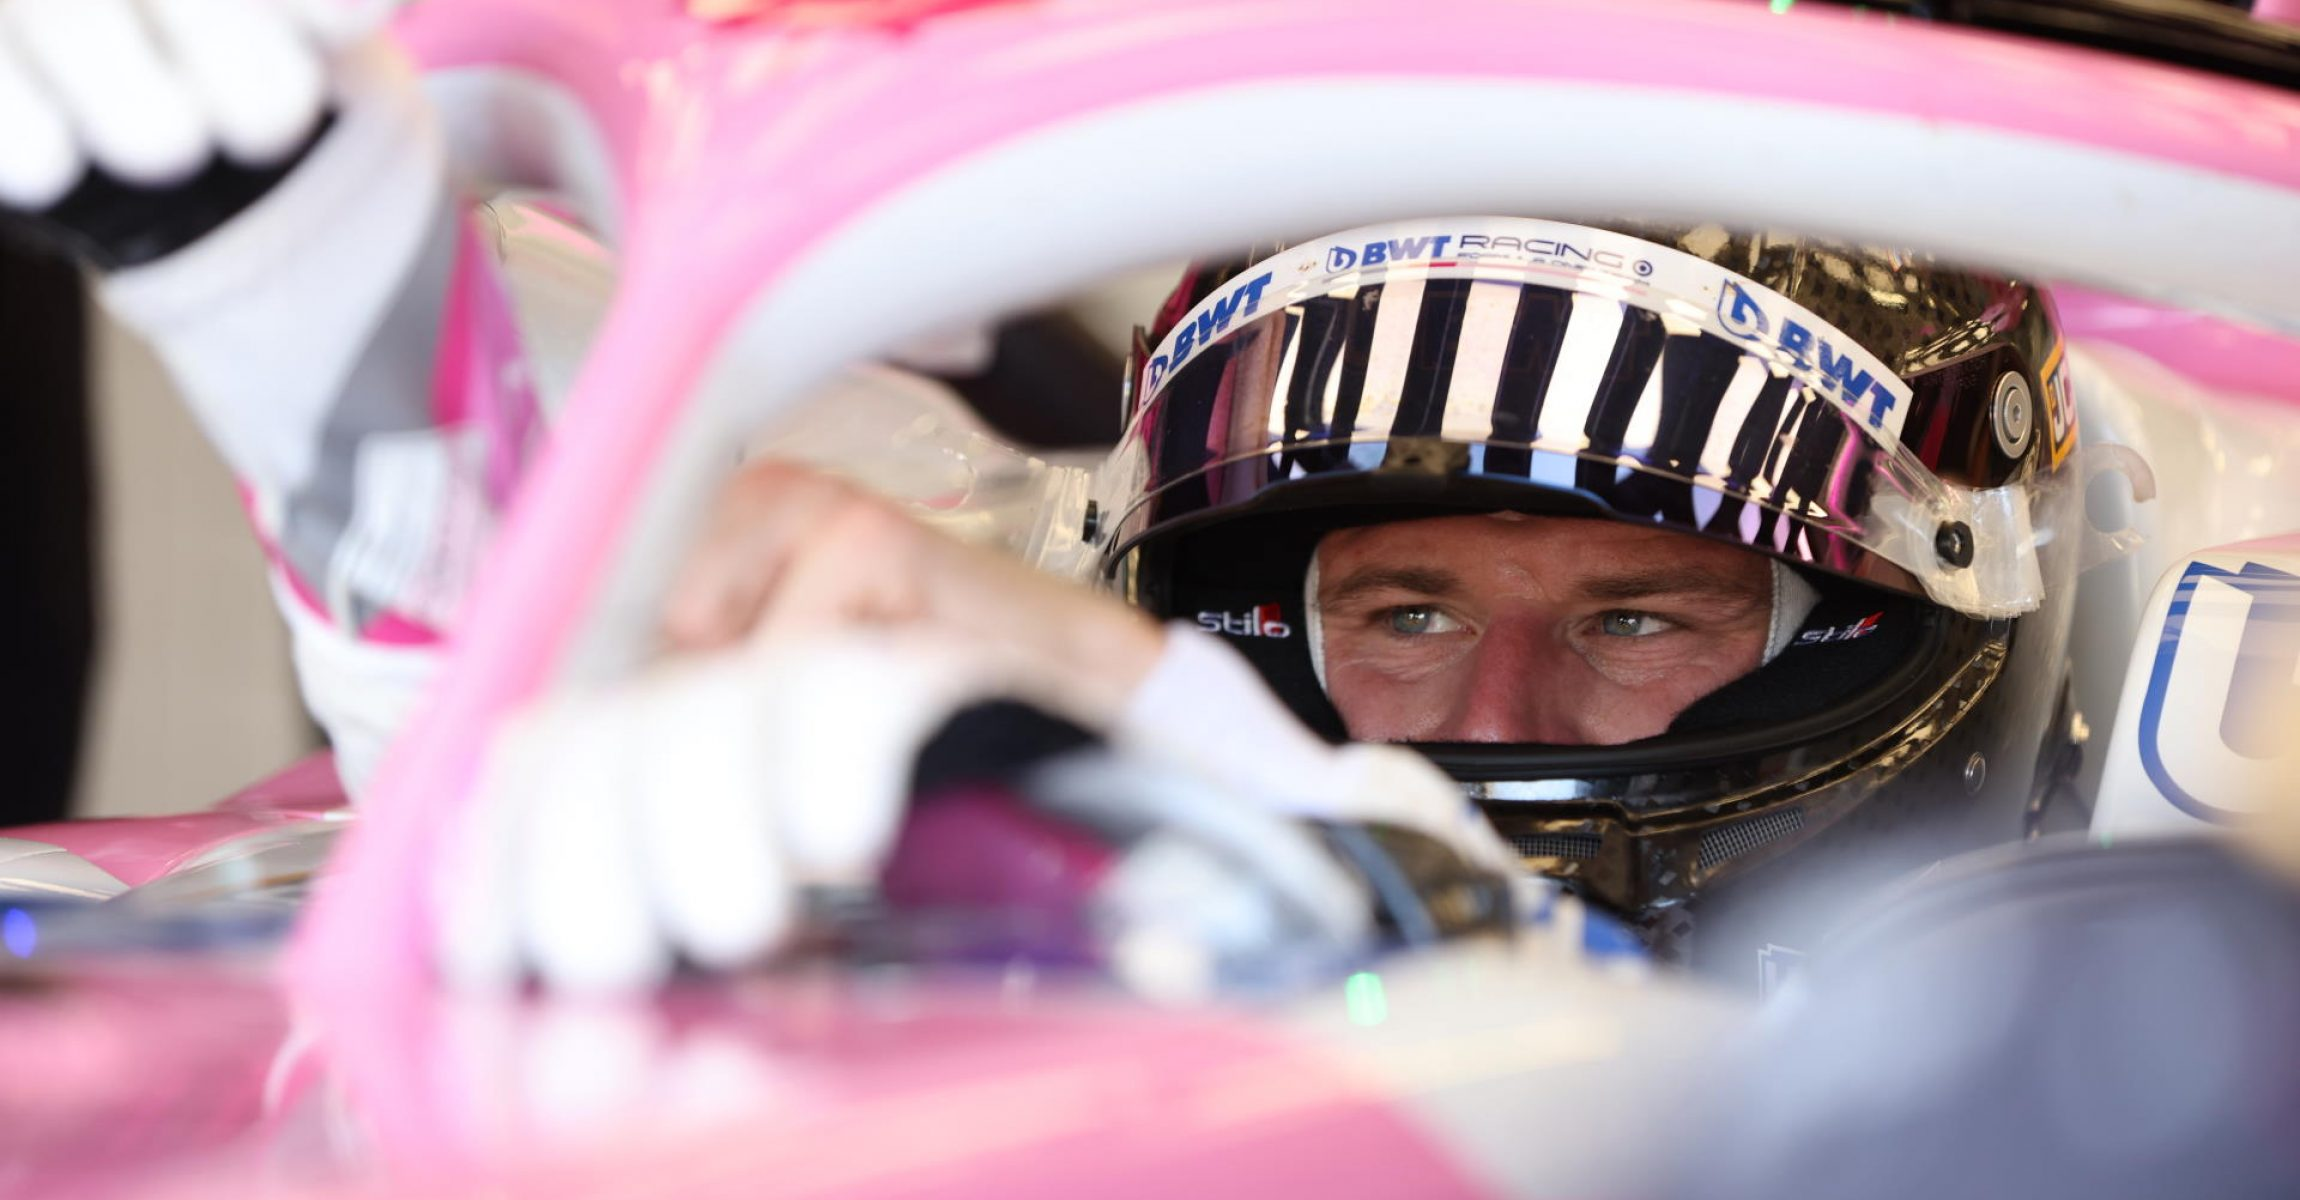 Nico Hülkenberg, Racing Point, British Grand Prix 2020, Silverstone